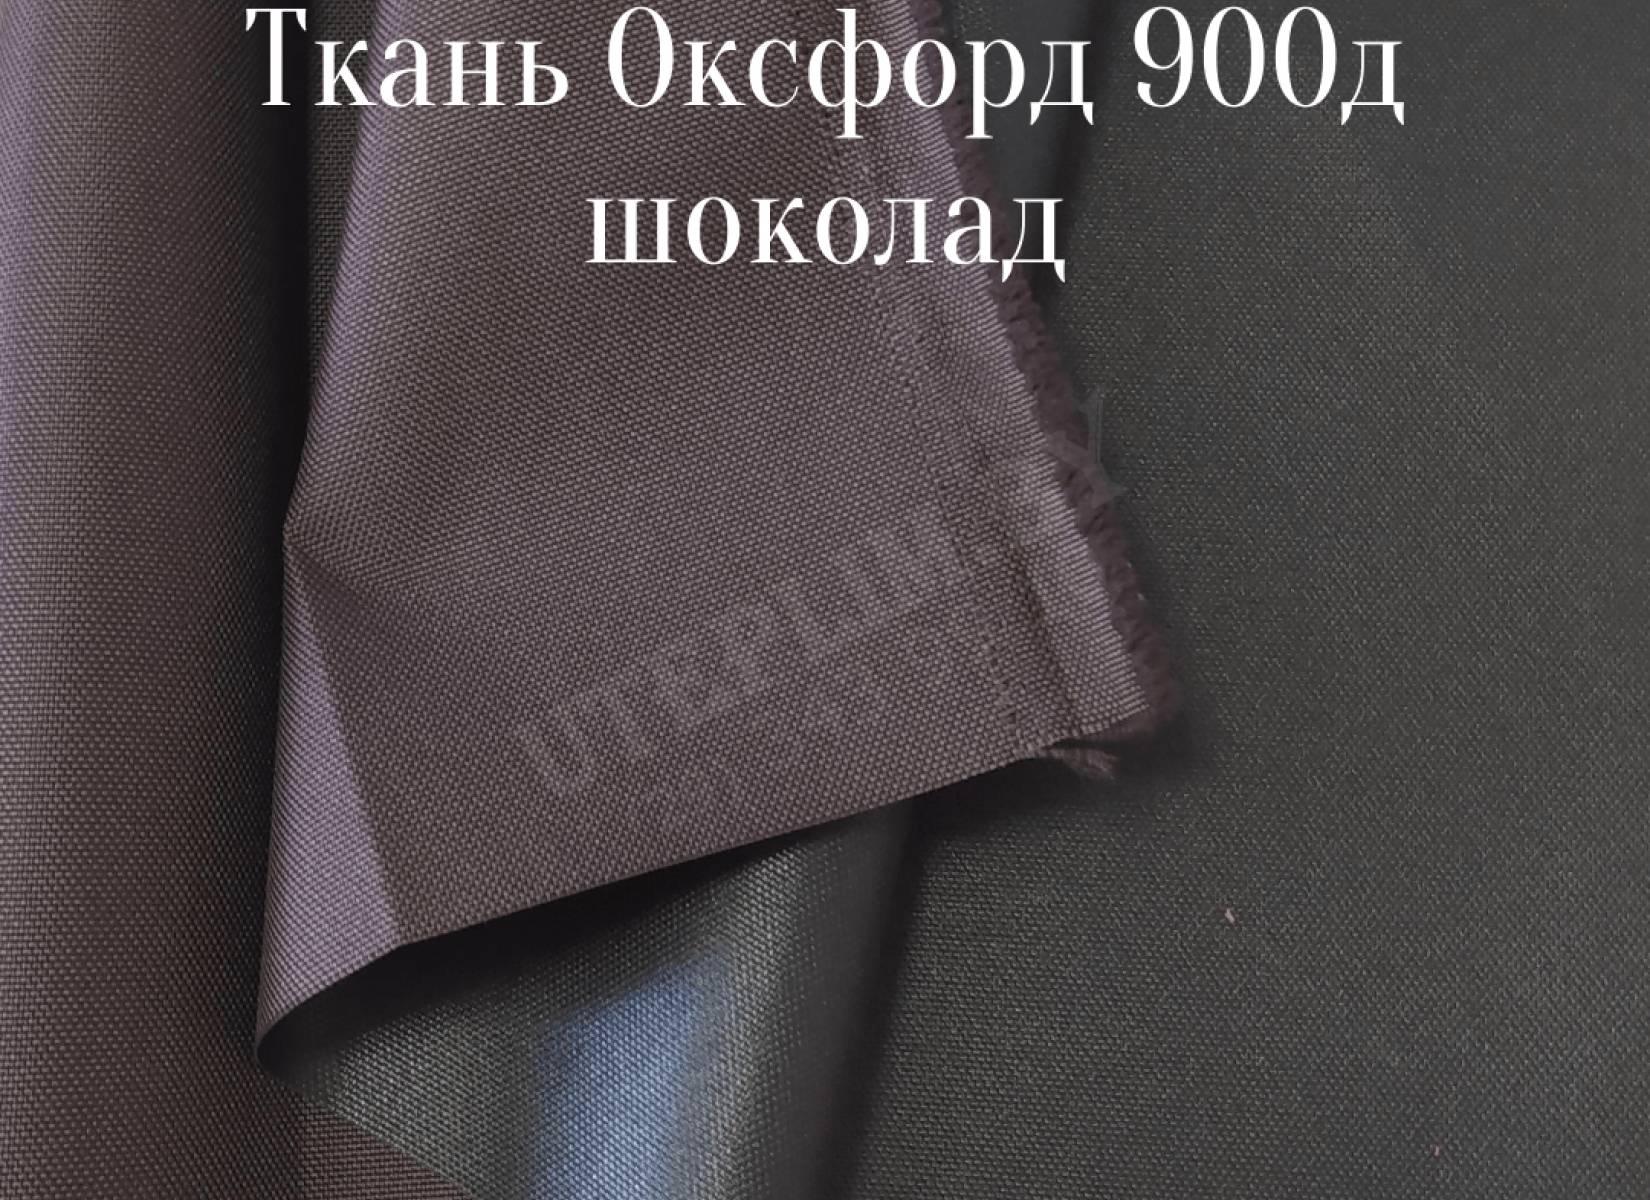 900д - шоколад